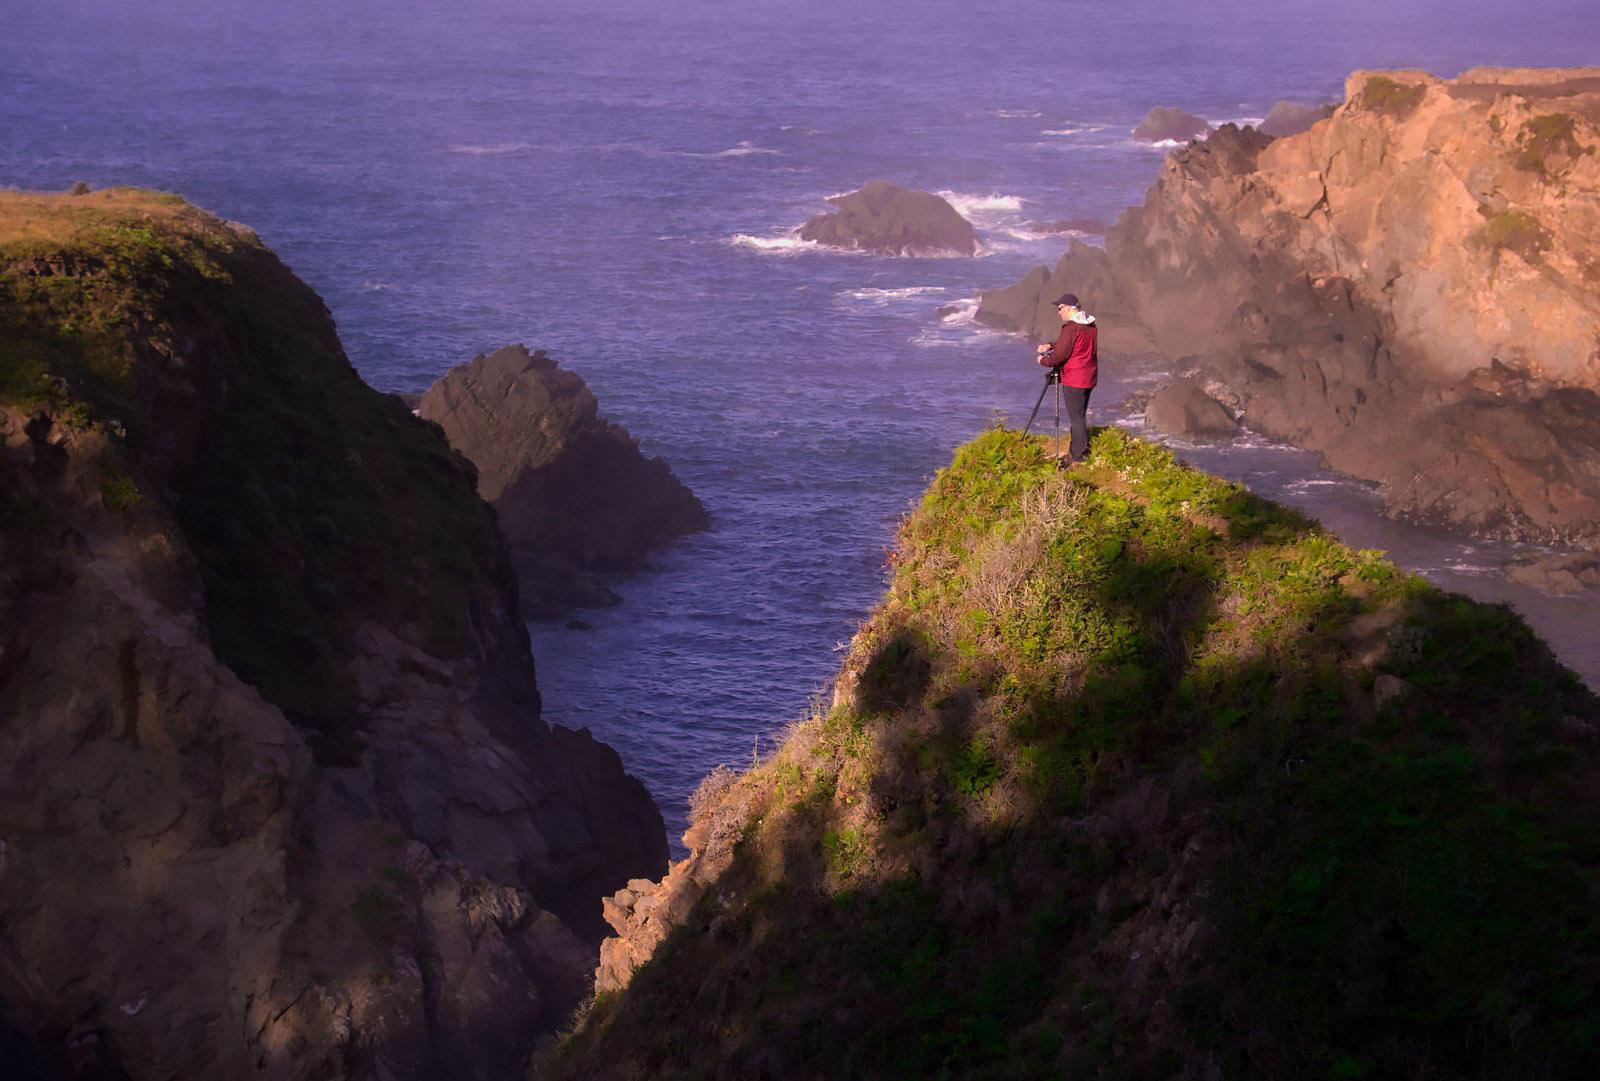 http://thedigitalstory.com/2017/05/23/IMGP1266-Stillwater-Cove-Luminar-Web.jpg